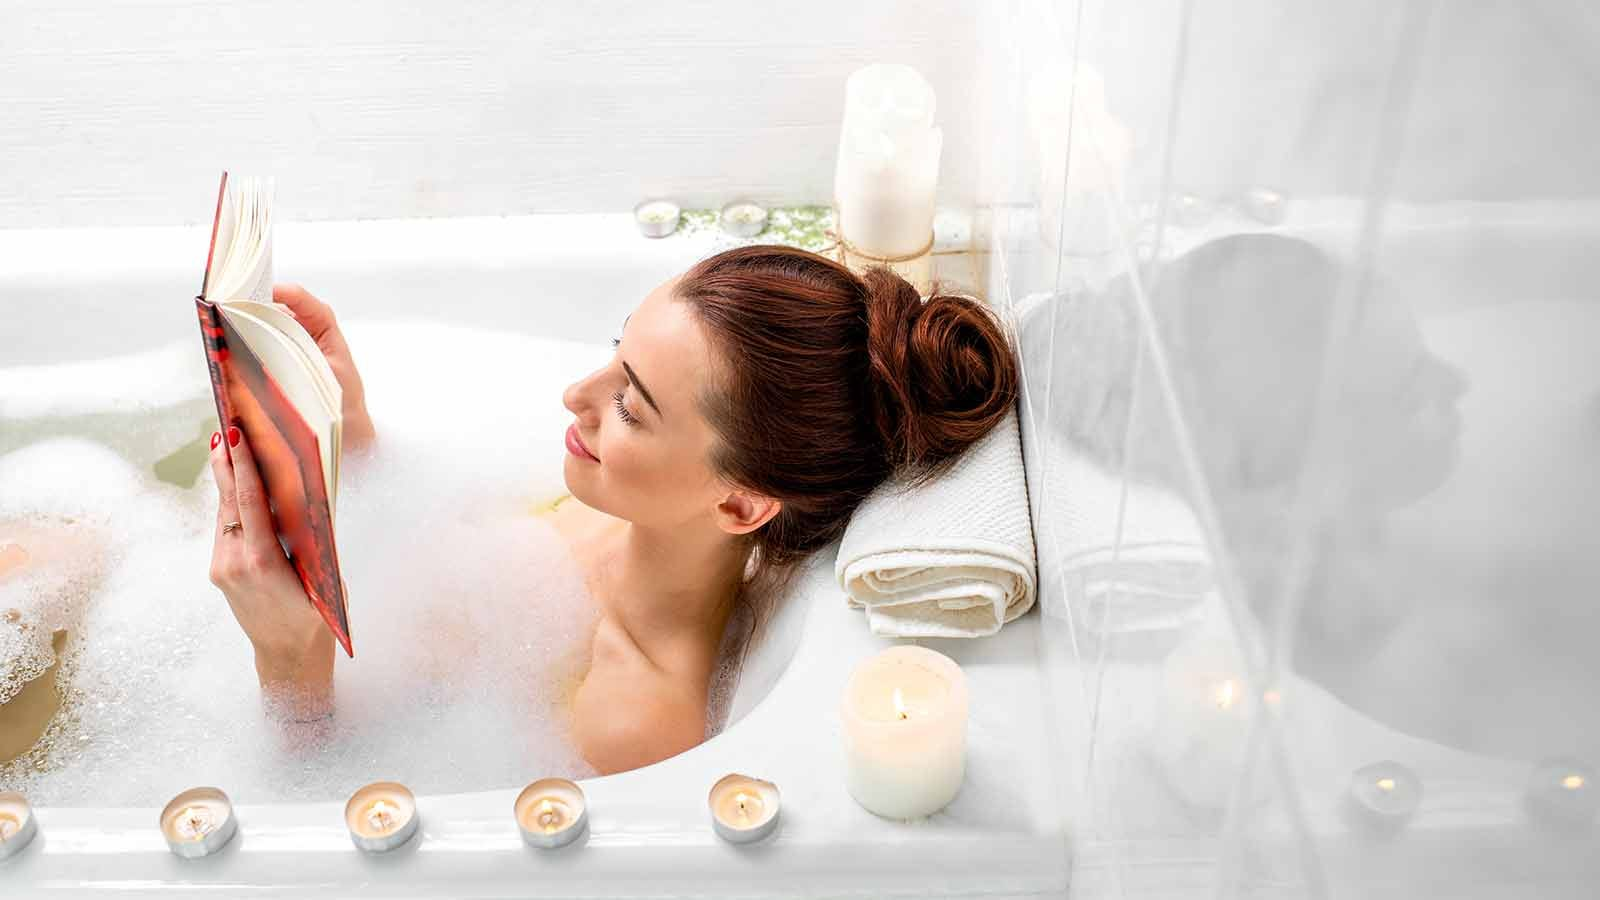 Woman soaking in the bathtub reading a book